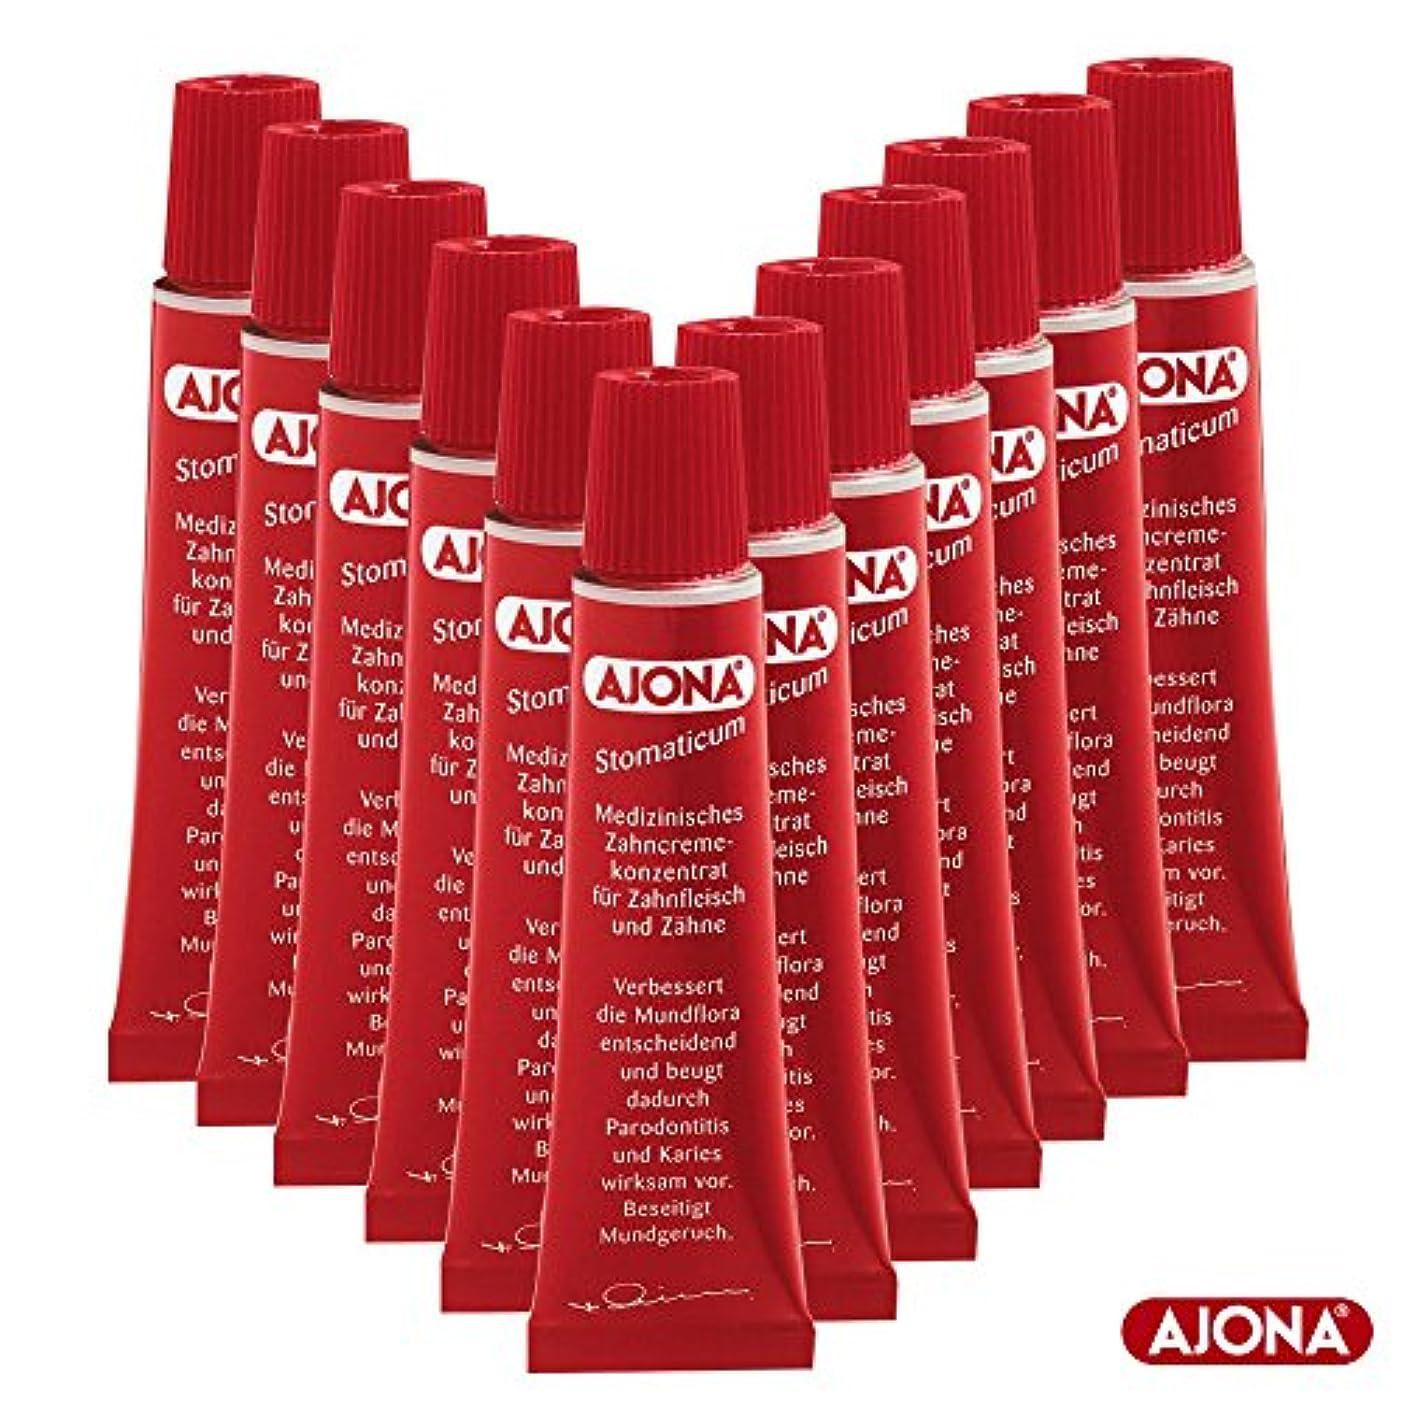 揃える松小学生Ajona 濃縮歯磨き粉 Stomaticum Toothpaste 25ml(12x 25ml)-12Pack [並行輸入品]